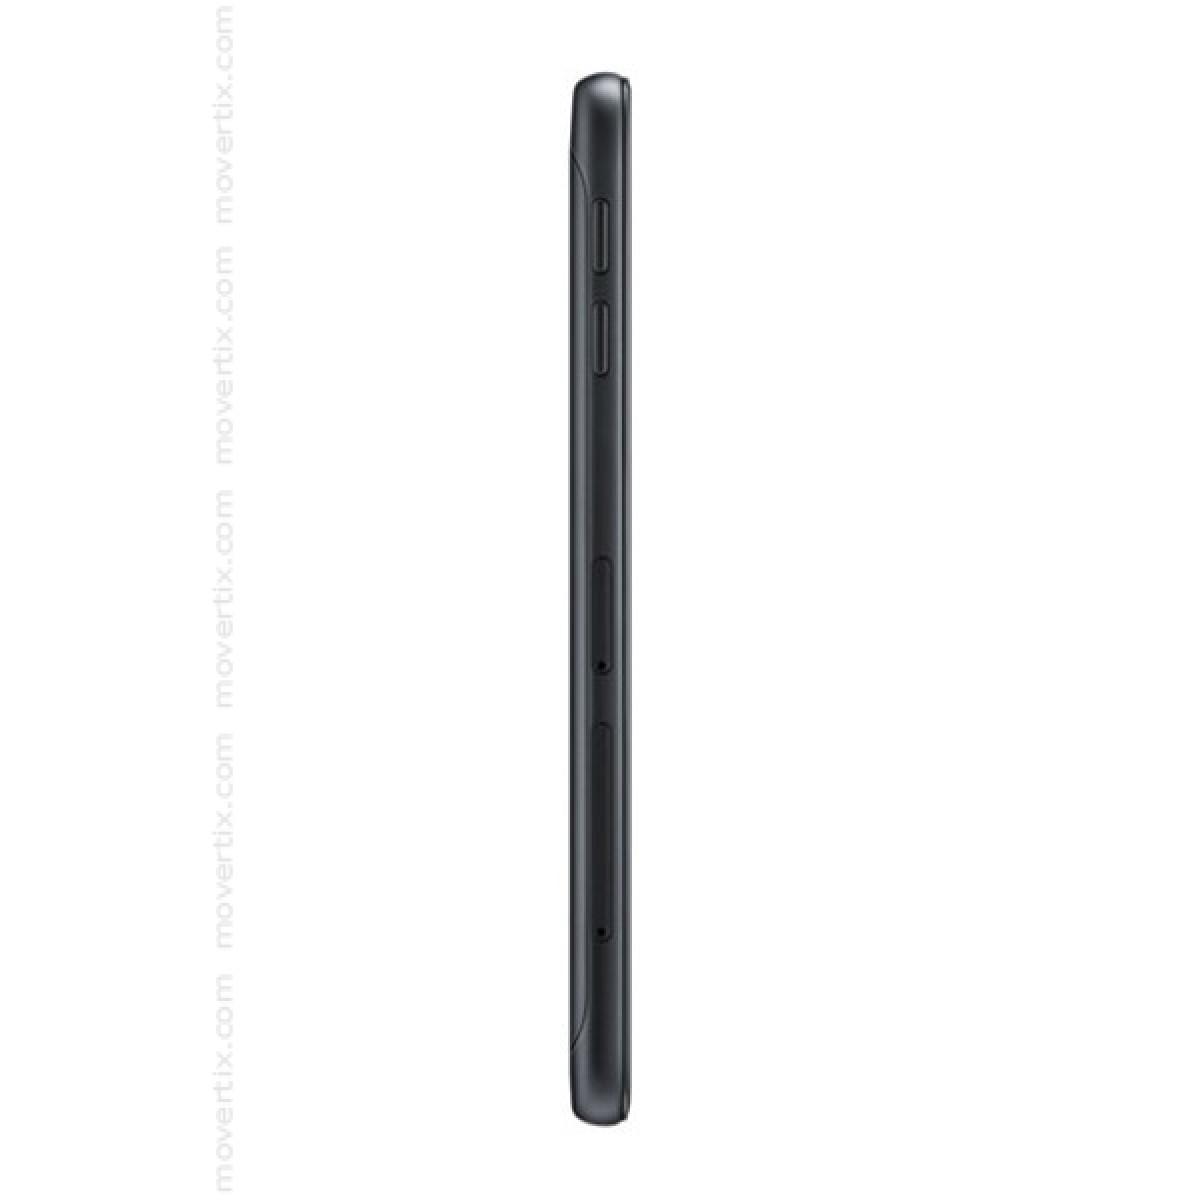 Samsung Galaxy J3 (2017) Dual SIM Black (SM-J330F/DS)